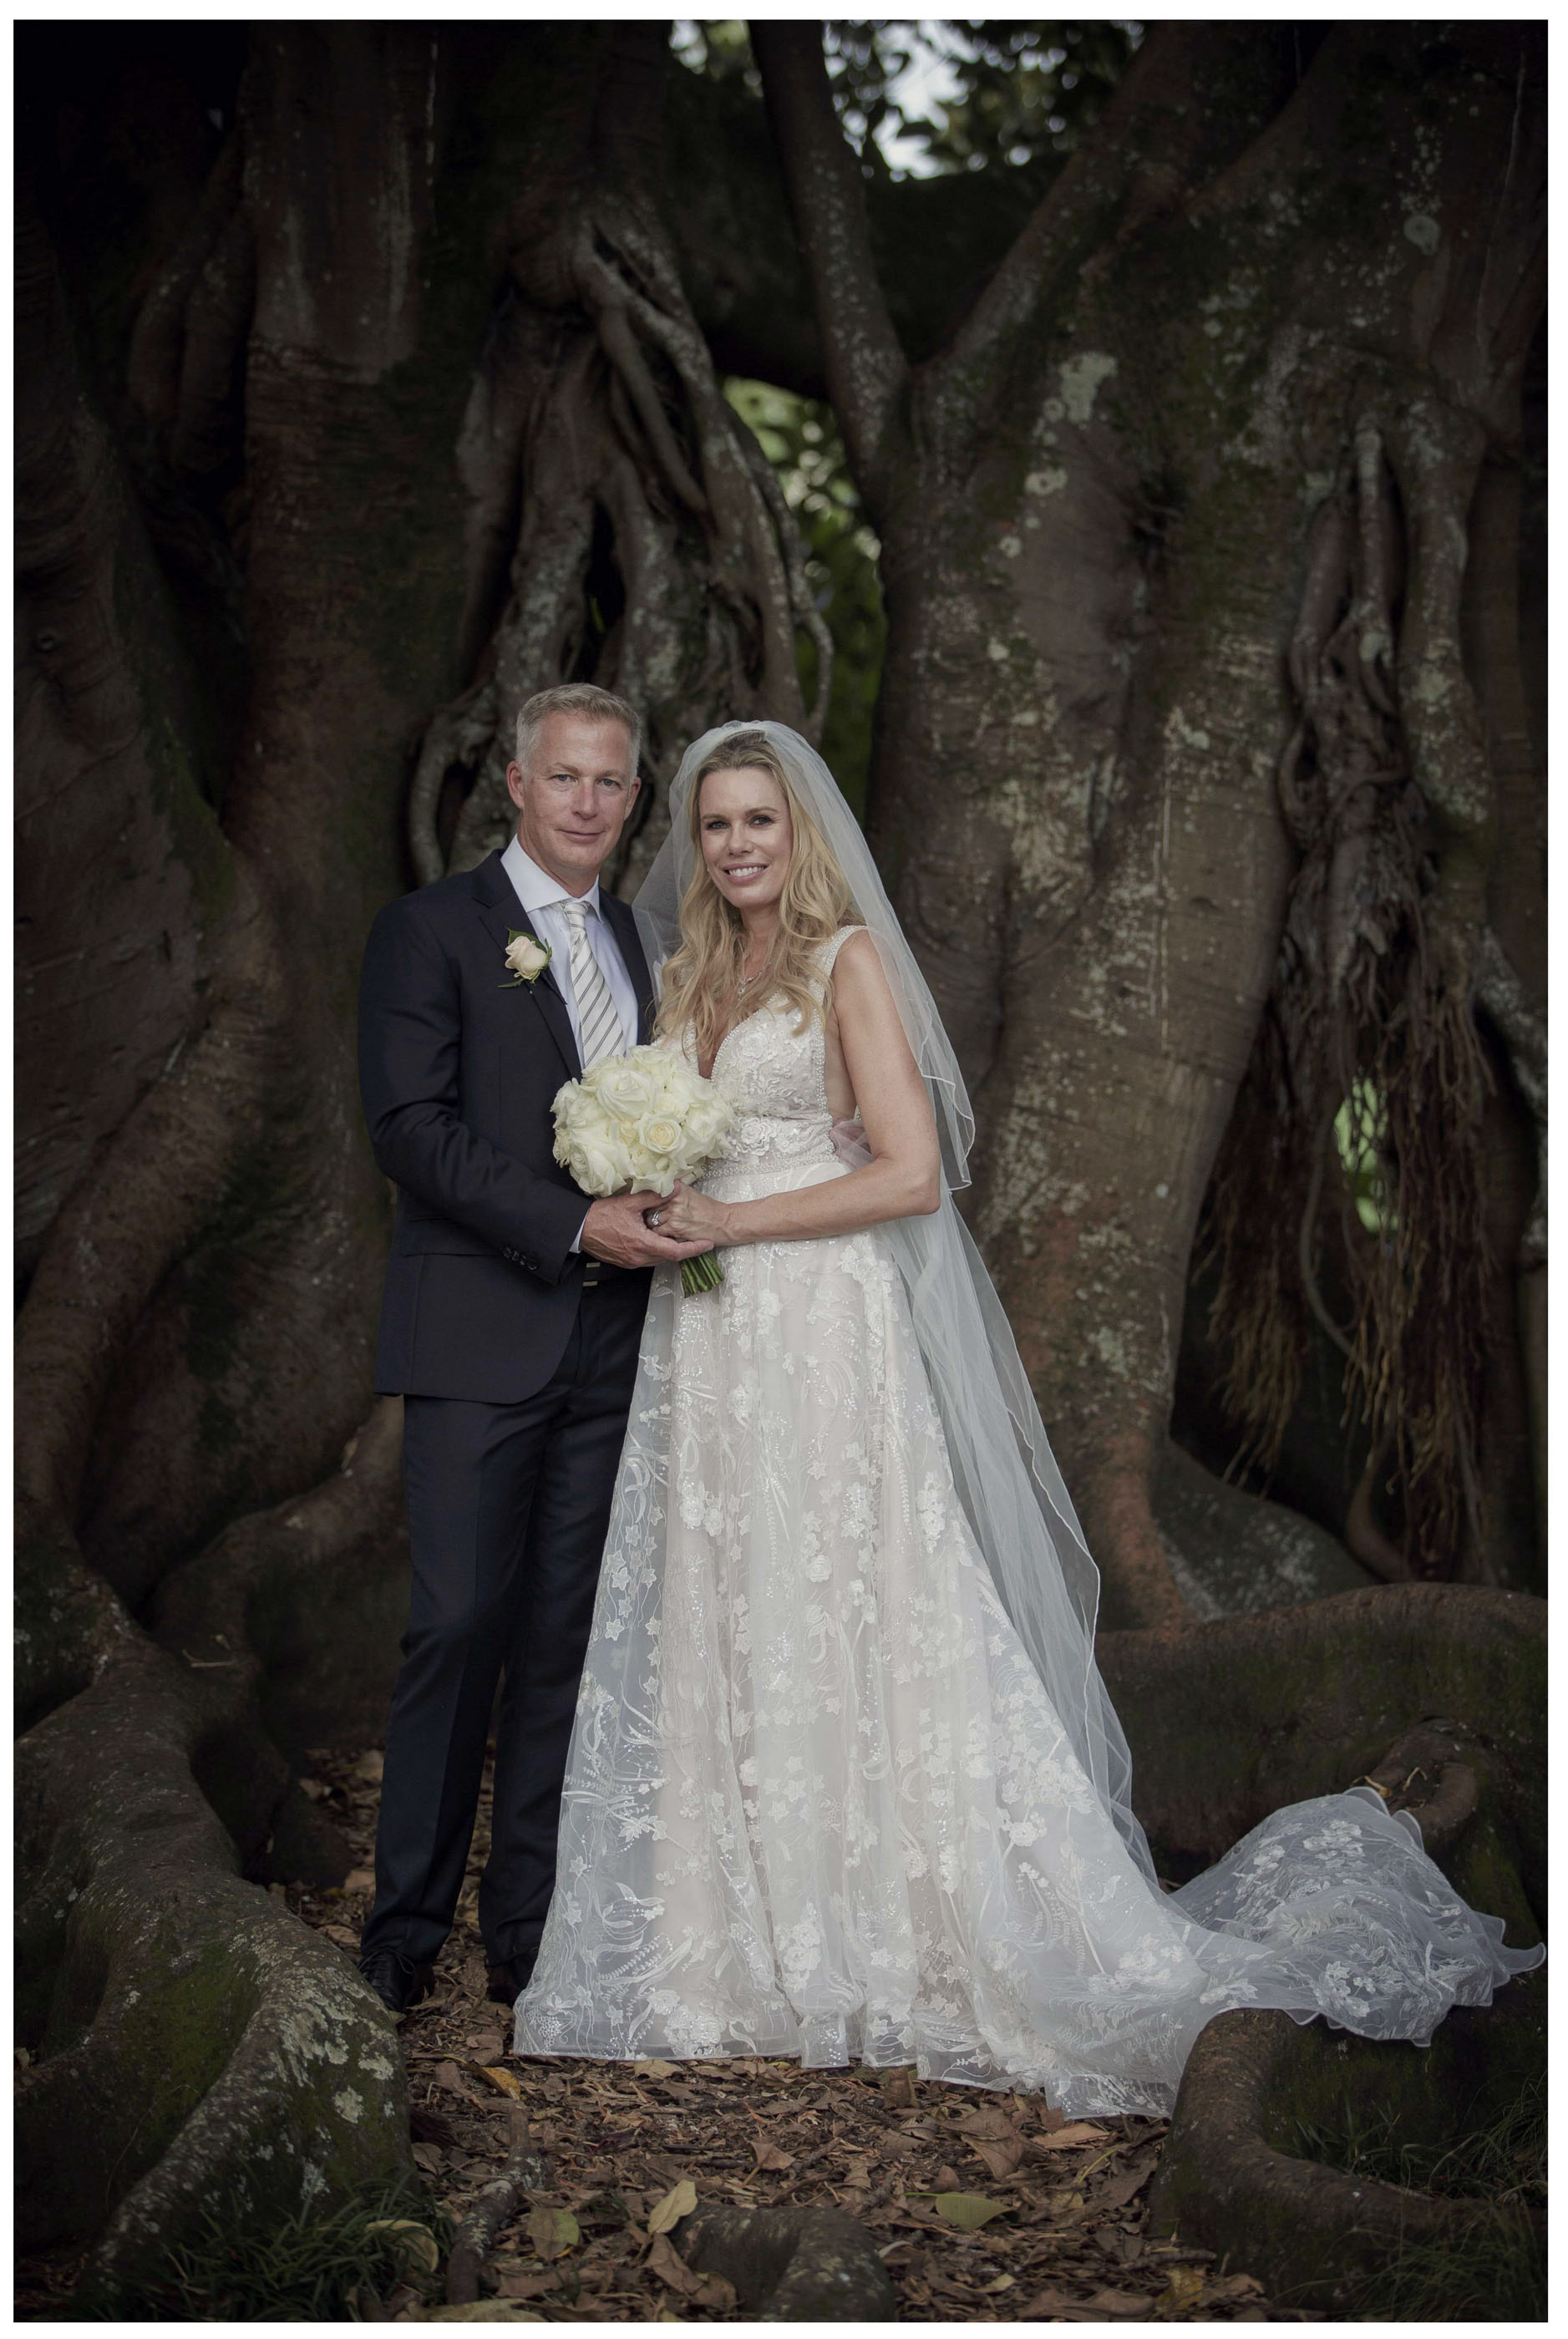 Wedding photo at Albert Park Chris Loufte www.theweddingphotographer.co.nz